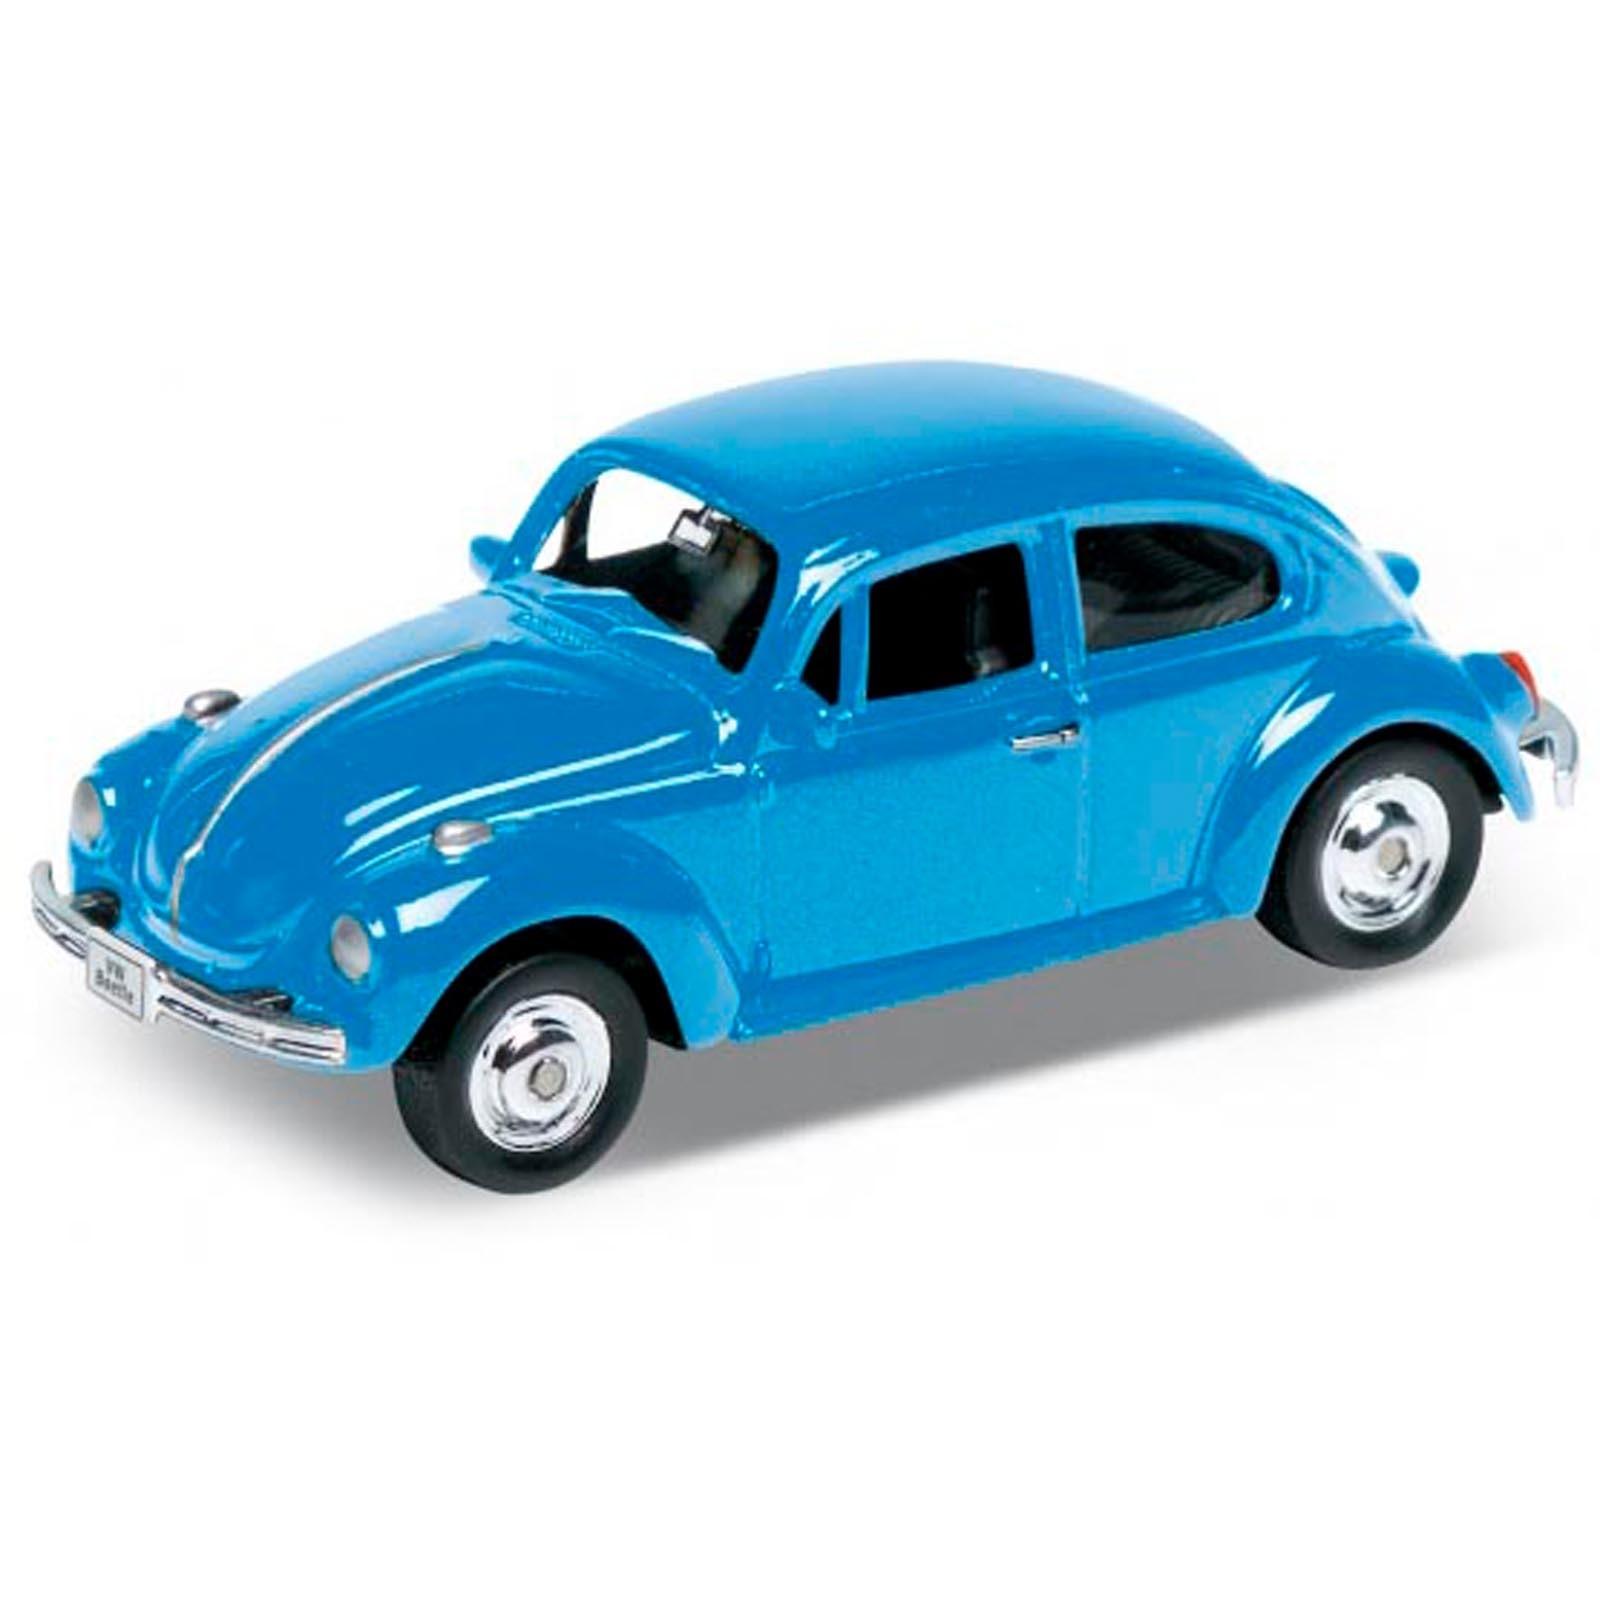 Miniatura - 1:64 - Volkswagen Beetle / Fusca - California Minis - Welly